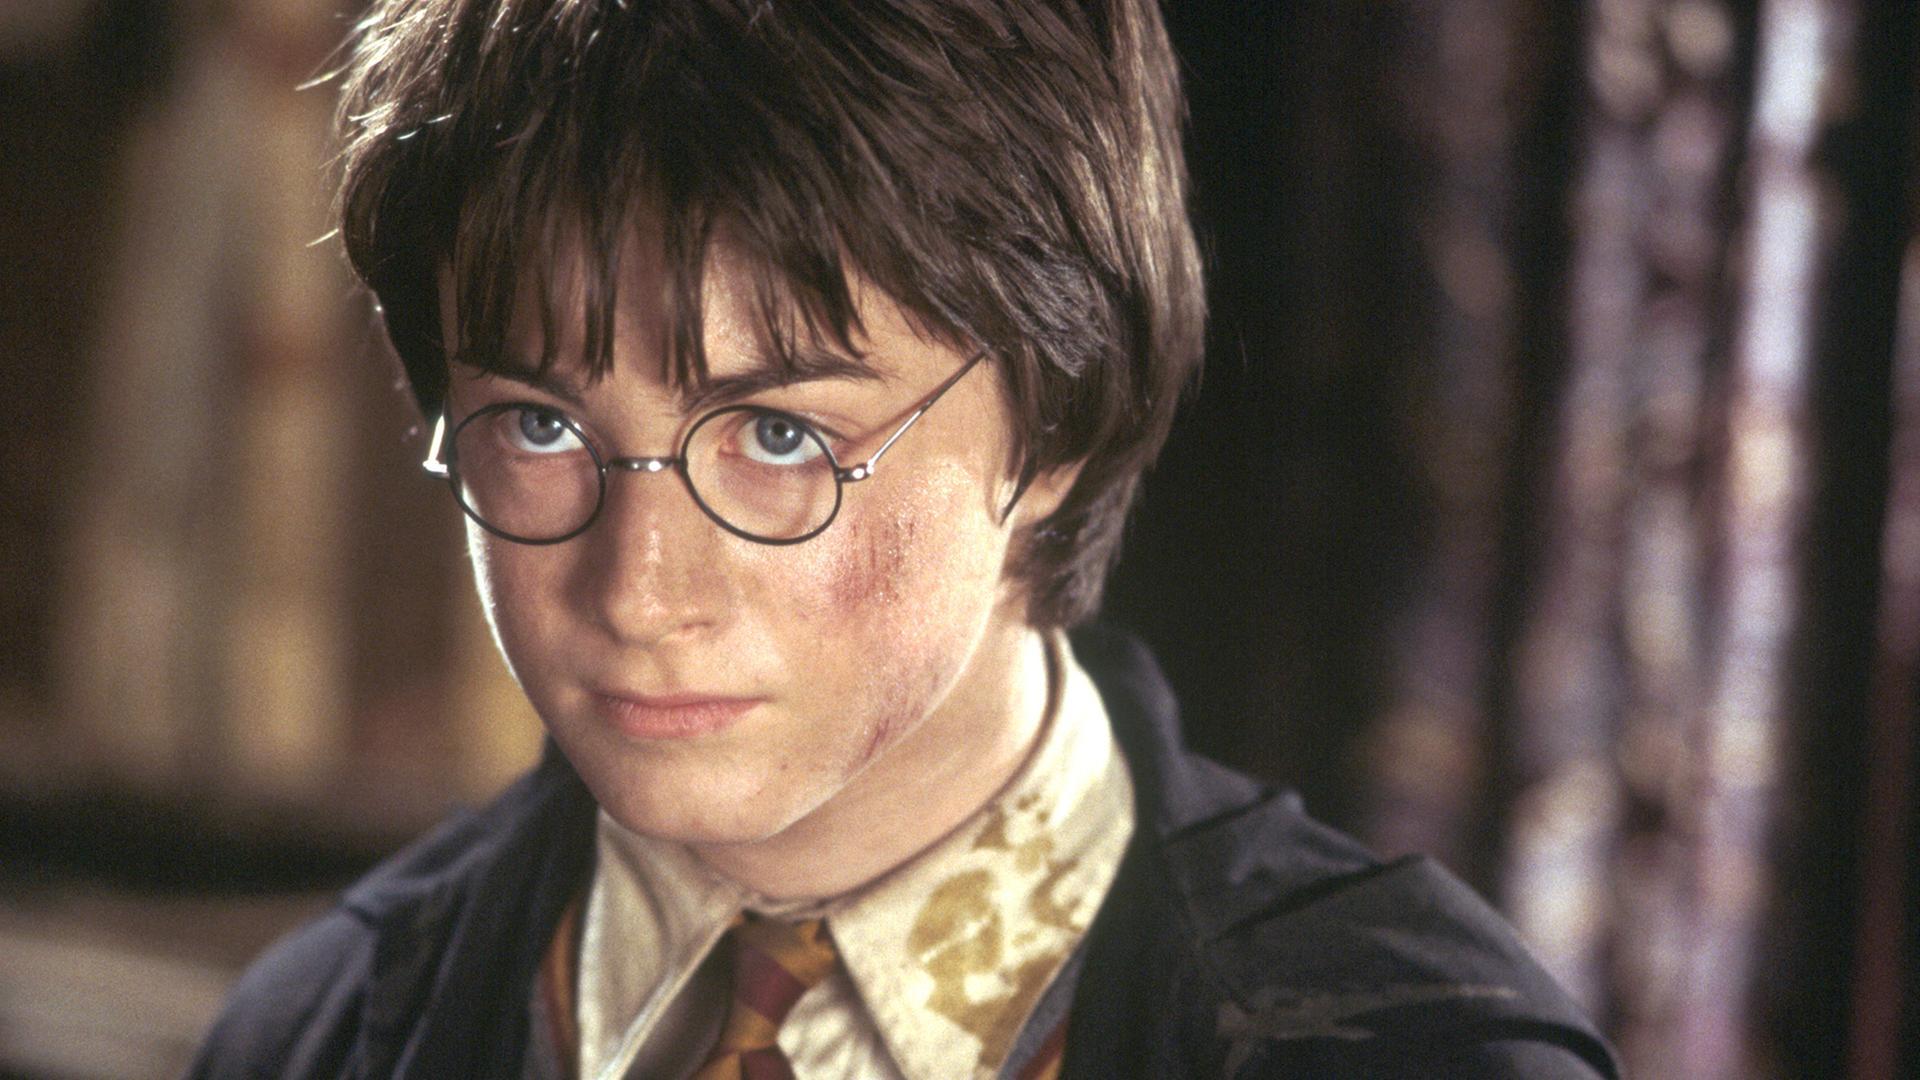 Logo Verruckte Harry Potter Studien Zdftivi